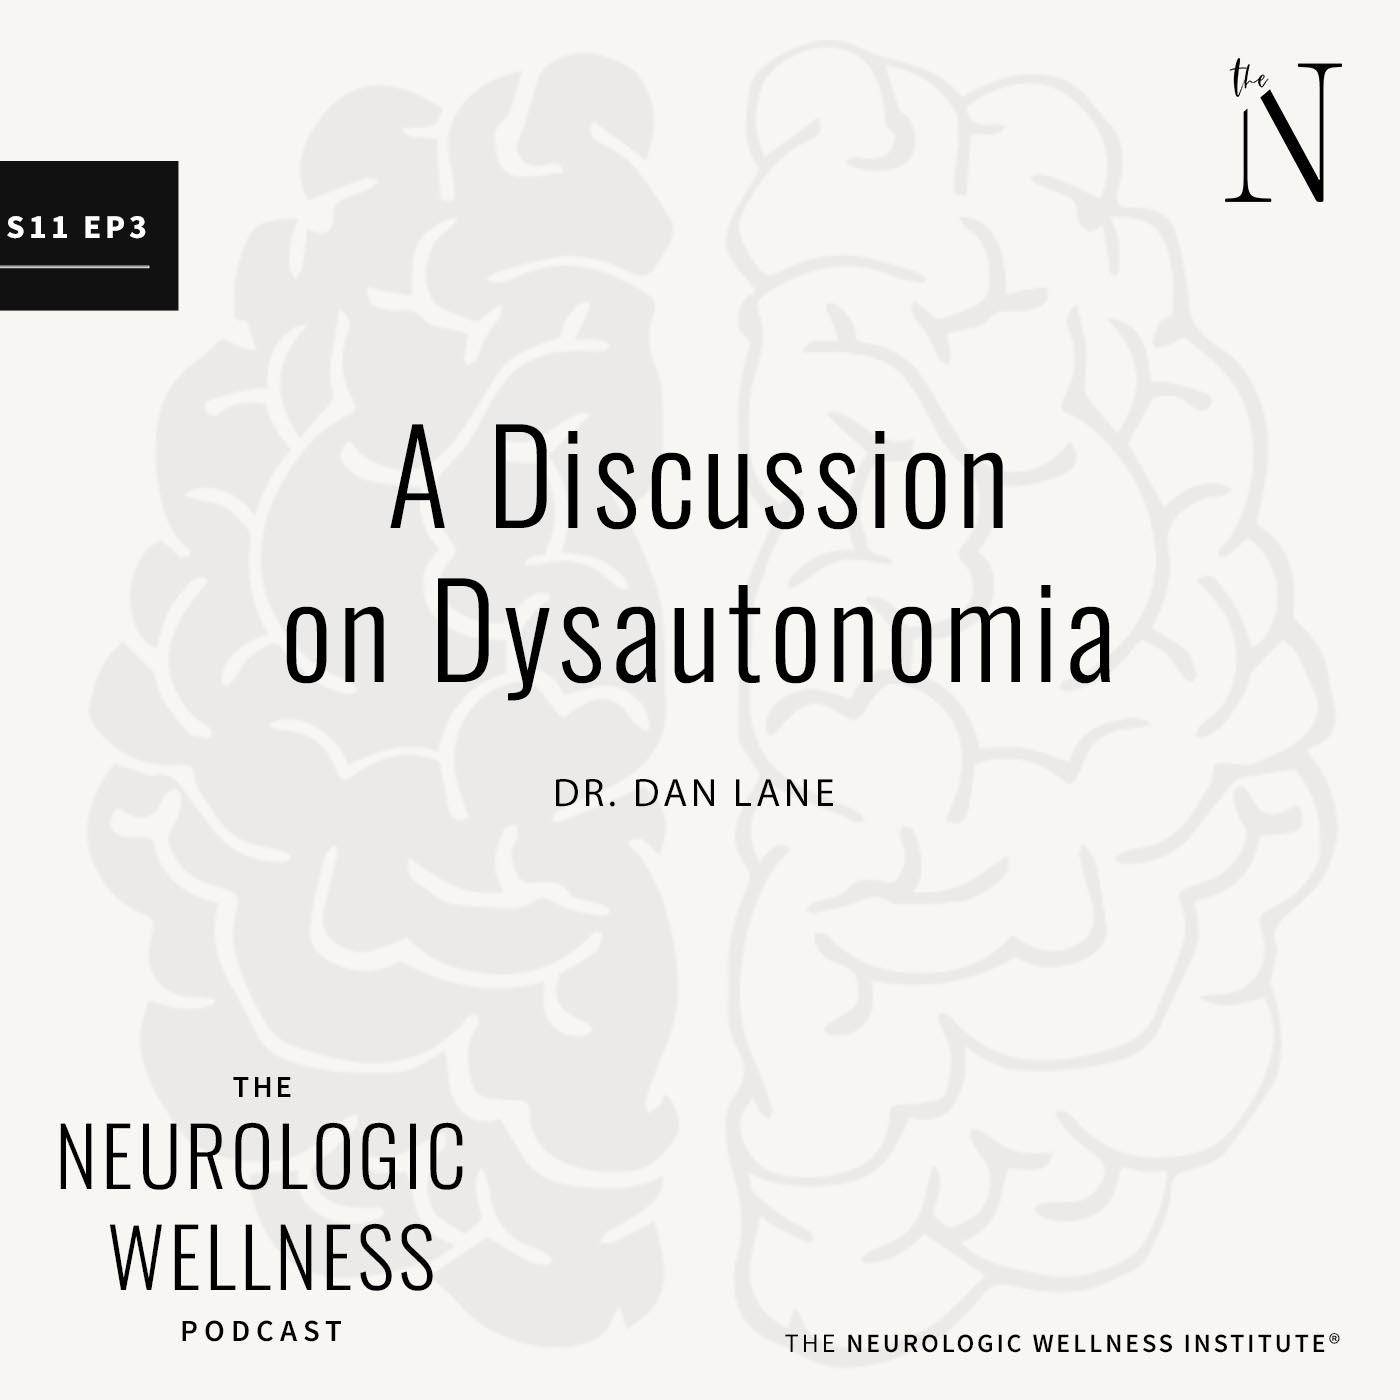 A Discussion on Dysautonomia